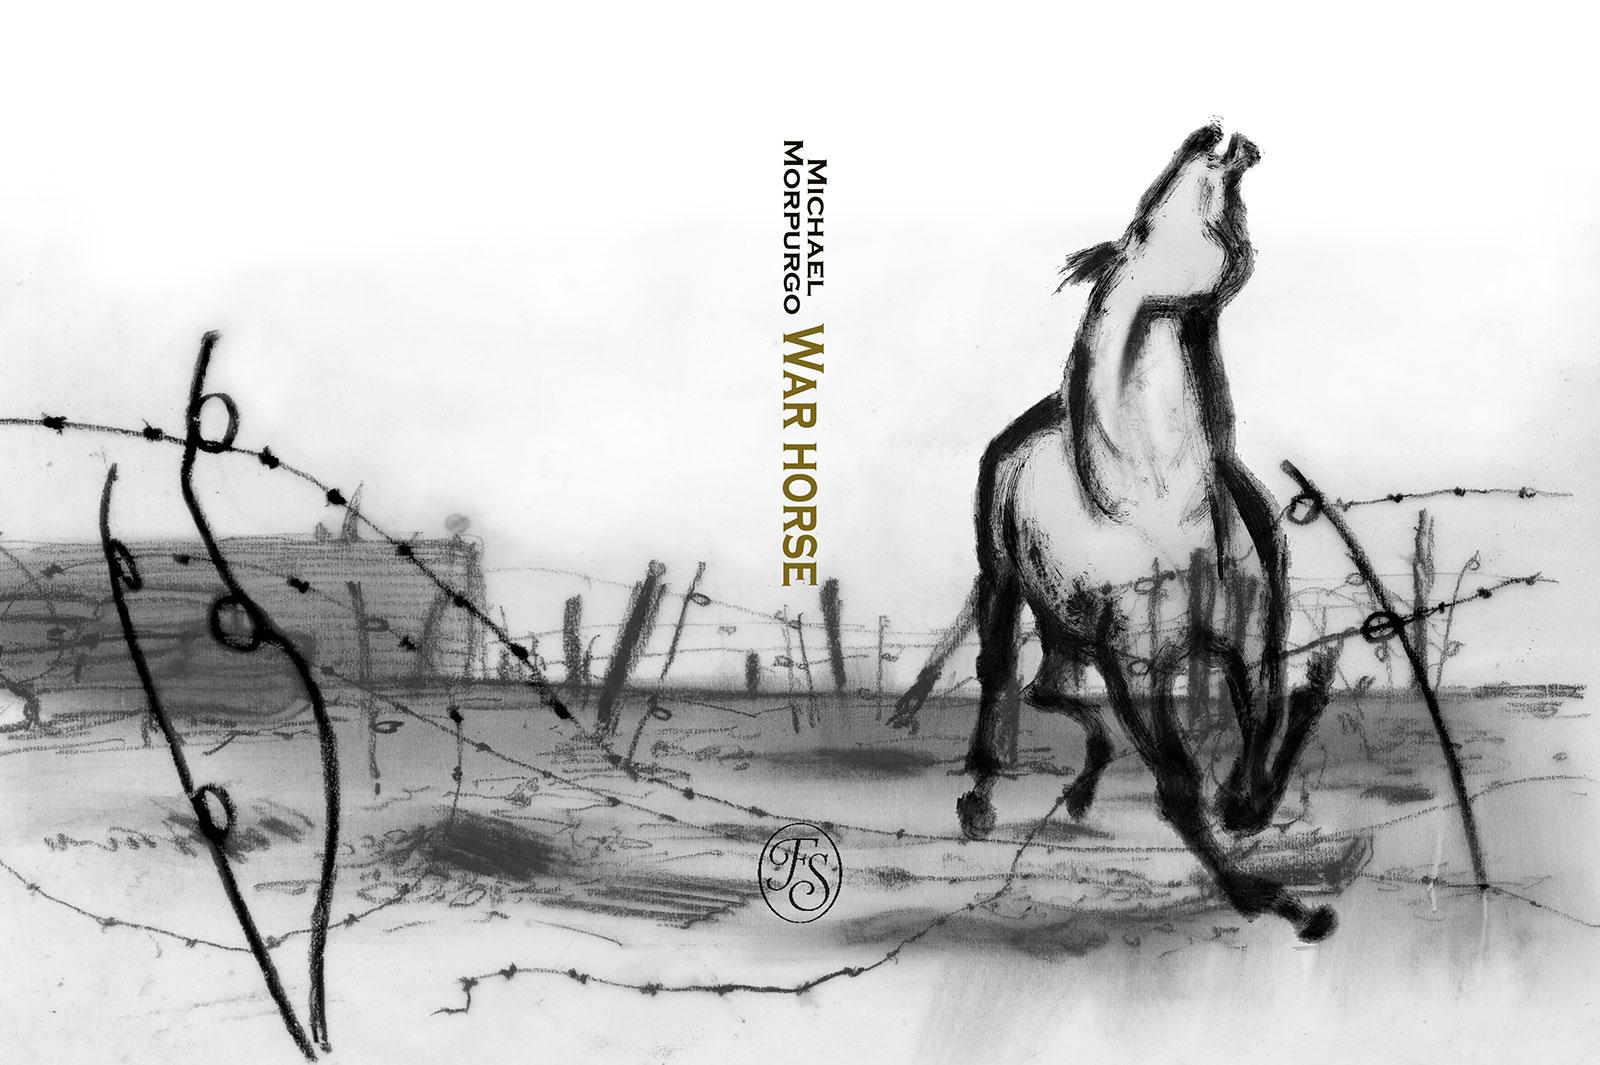 War Horse Folio Society Competition Fi Smart